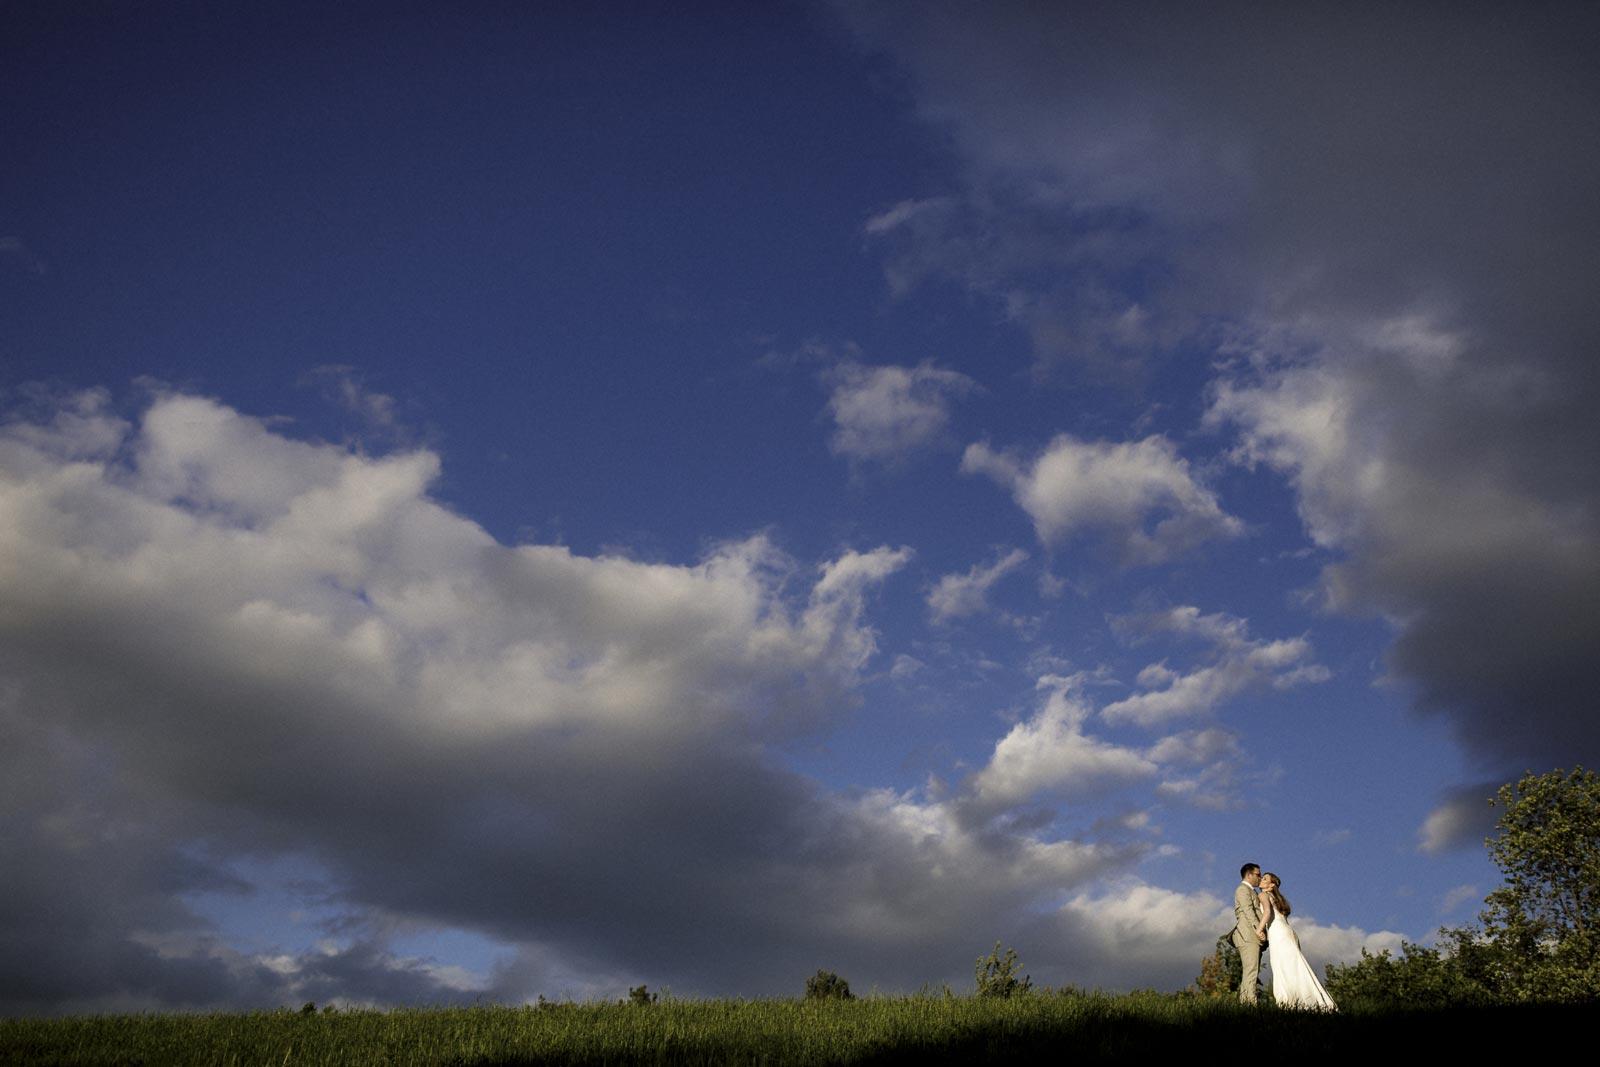 barn-at-liberty-farms-wedding-hudson-valley-alekseyk-photography-60.jpg